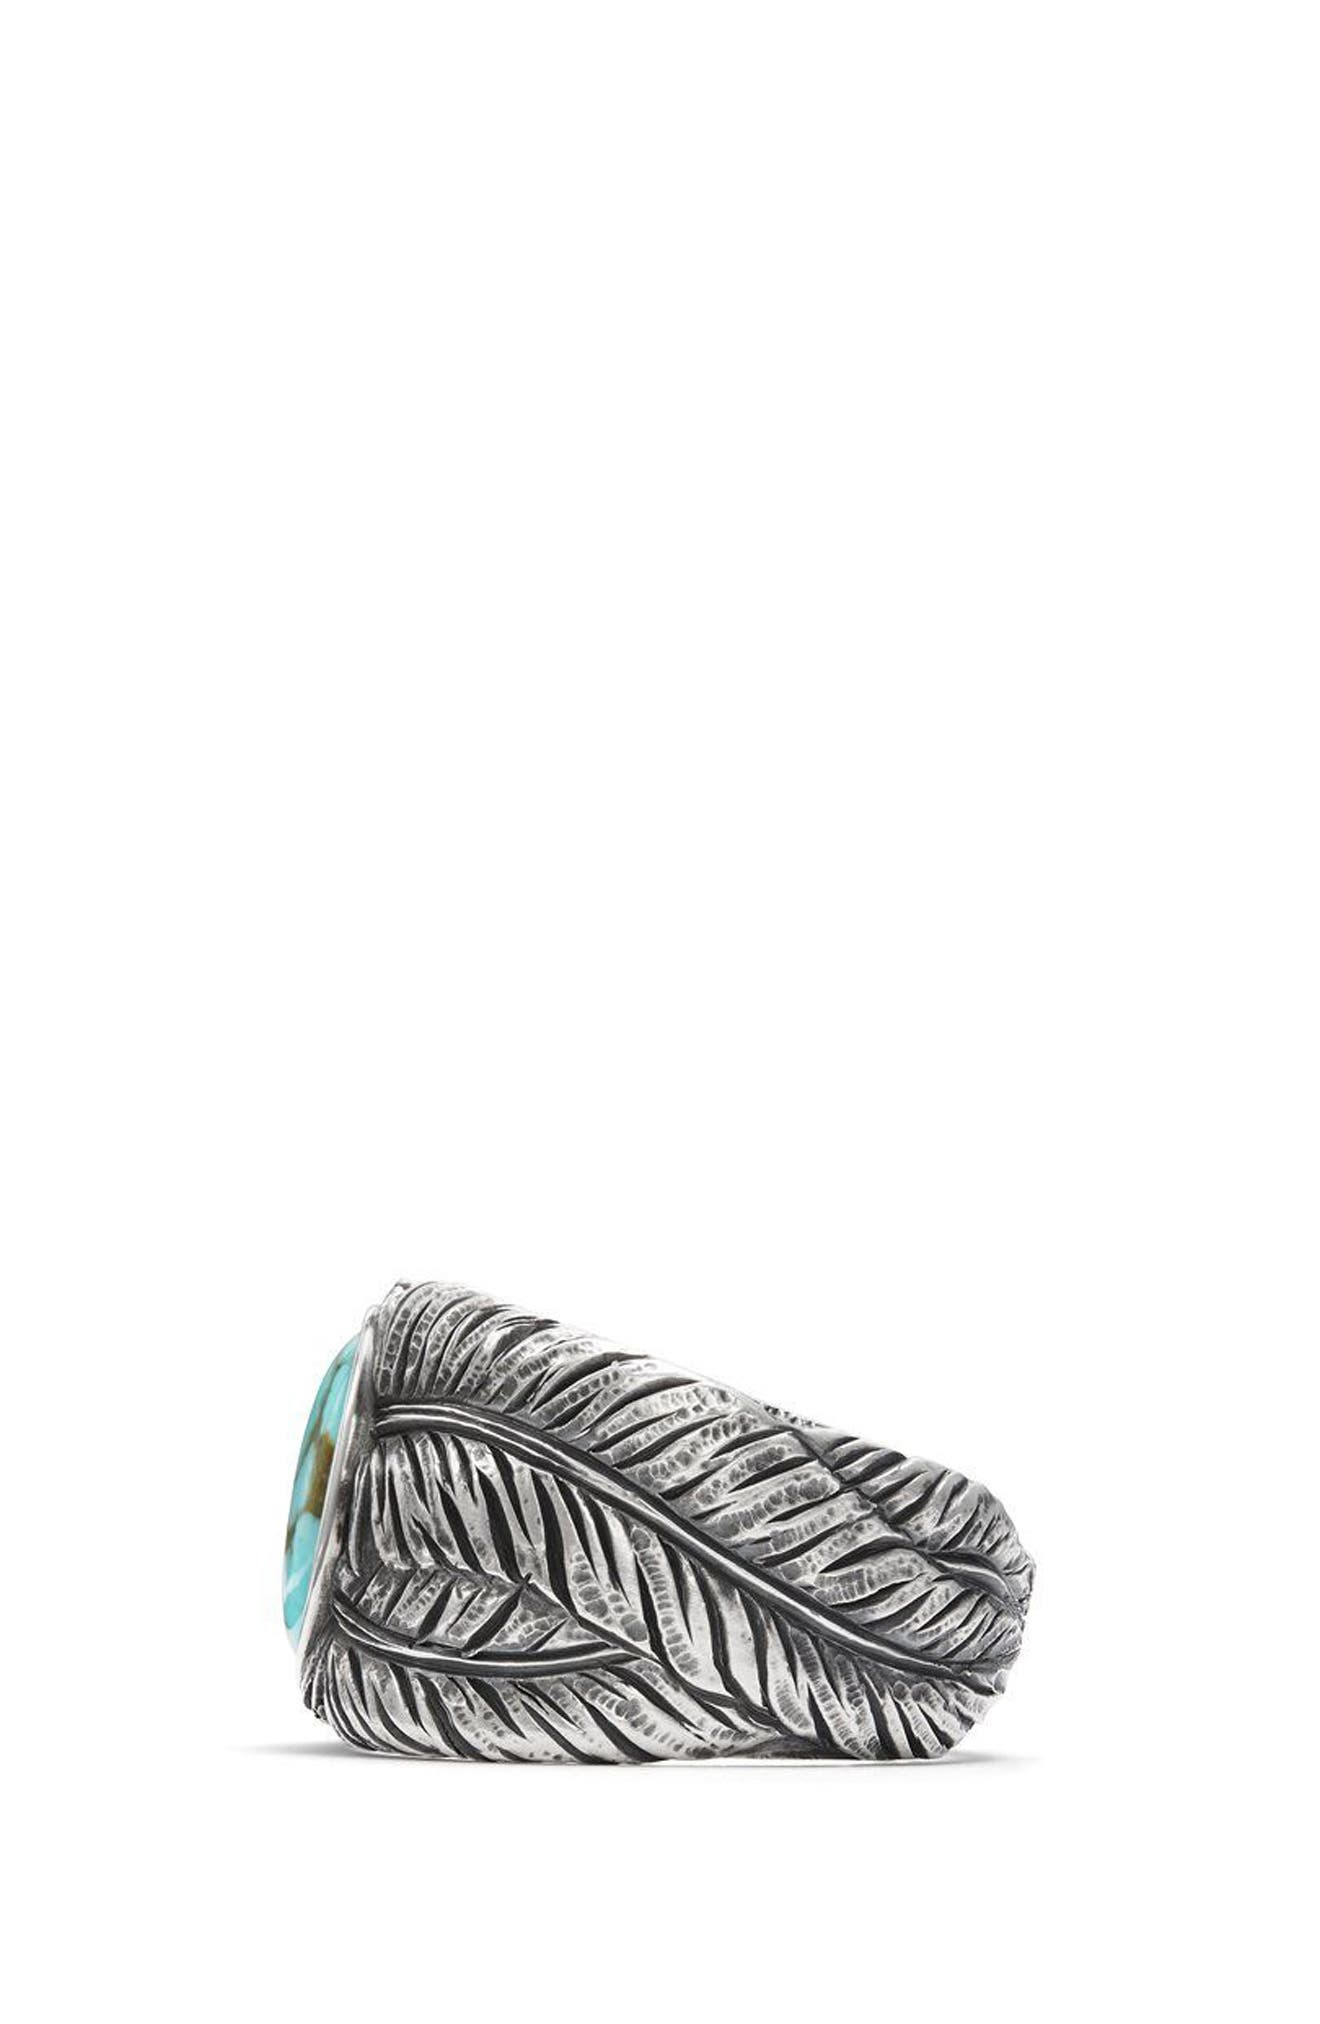 Alternate Image 2  - David Yurman Southwest Cigar Band Feather Ring with Turquoise